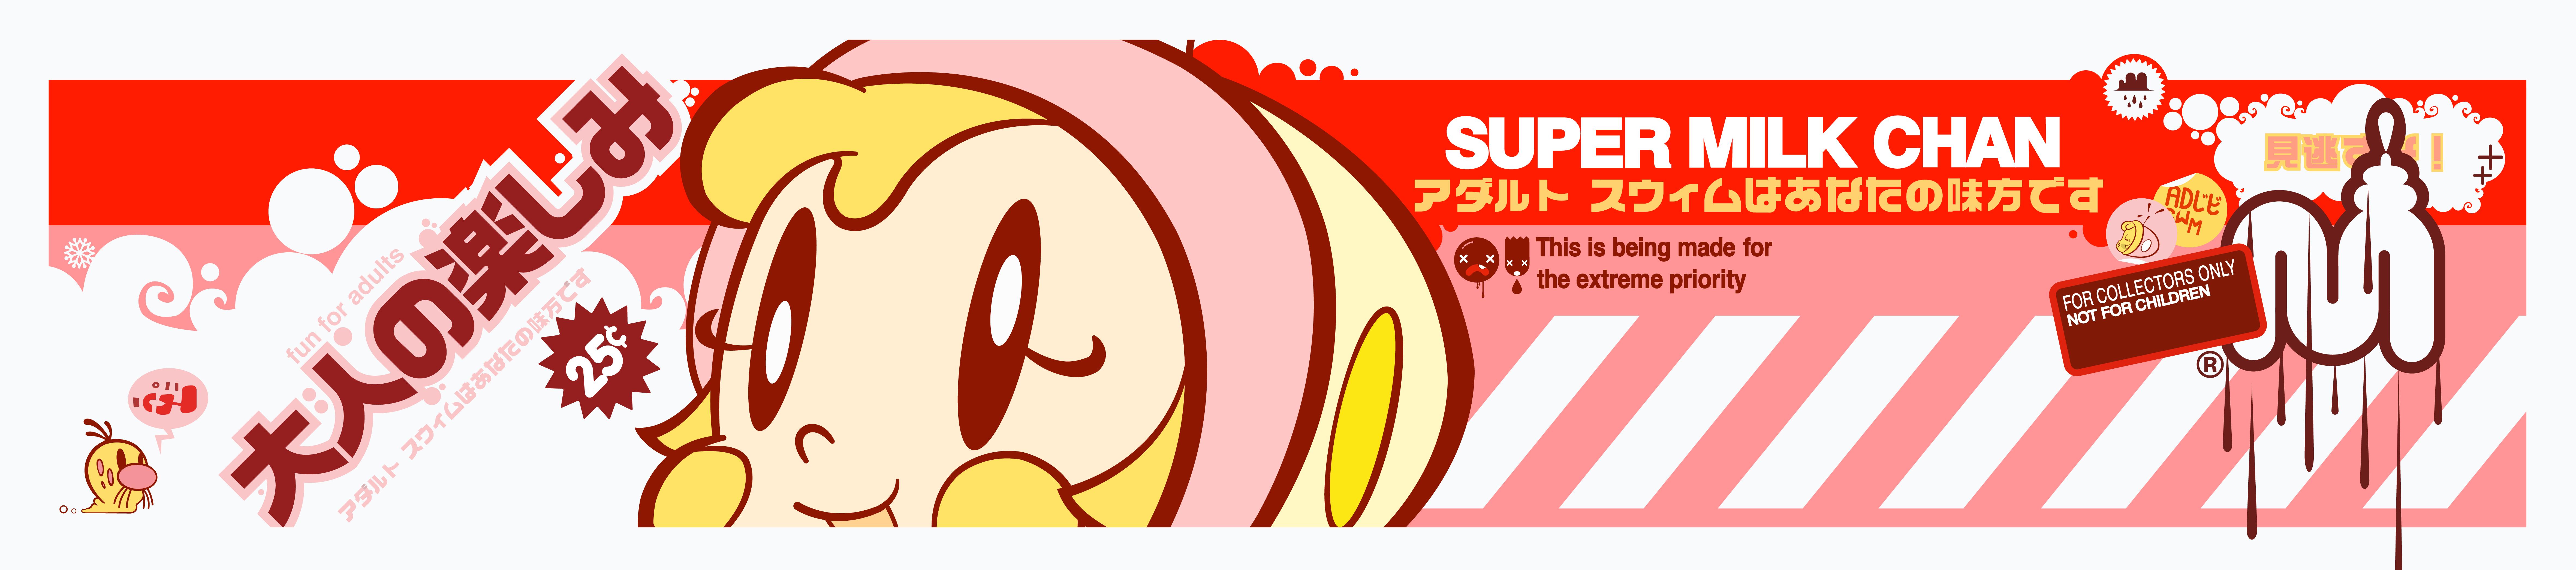 General 9449x2092 Super Milk Chan TV bumper Adult Swim red pink yellow white